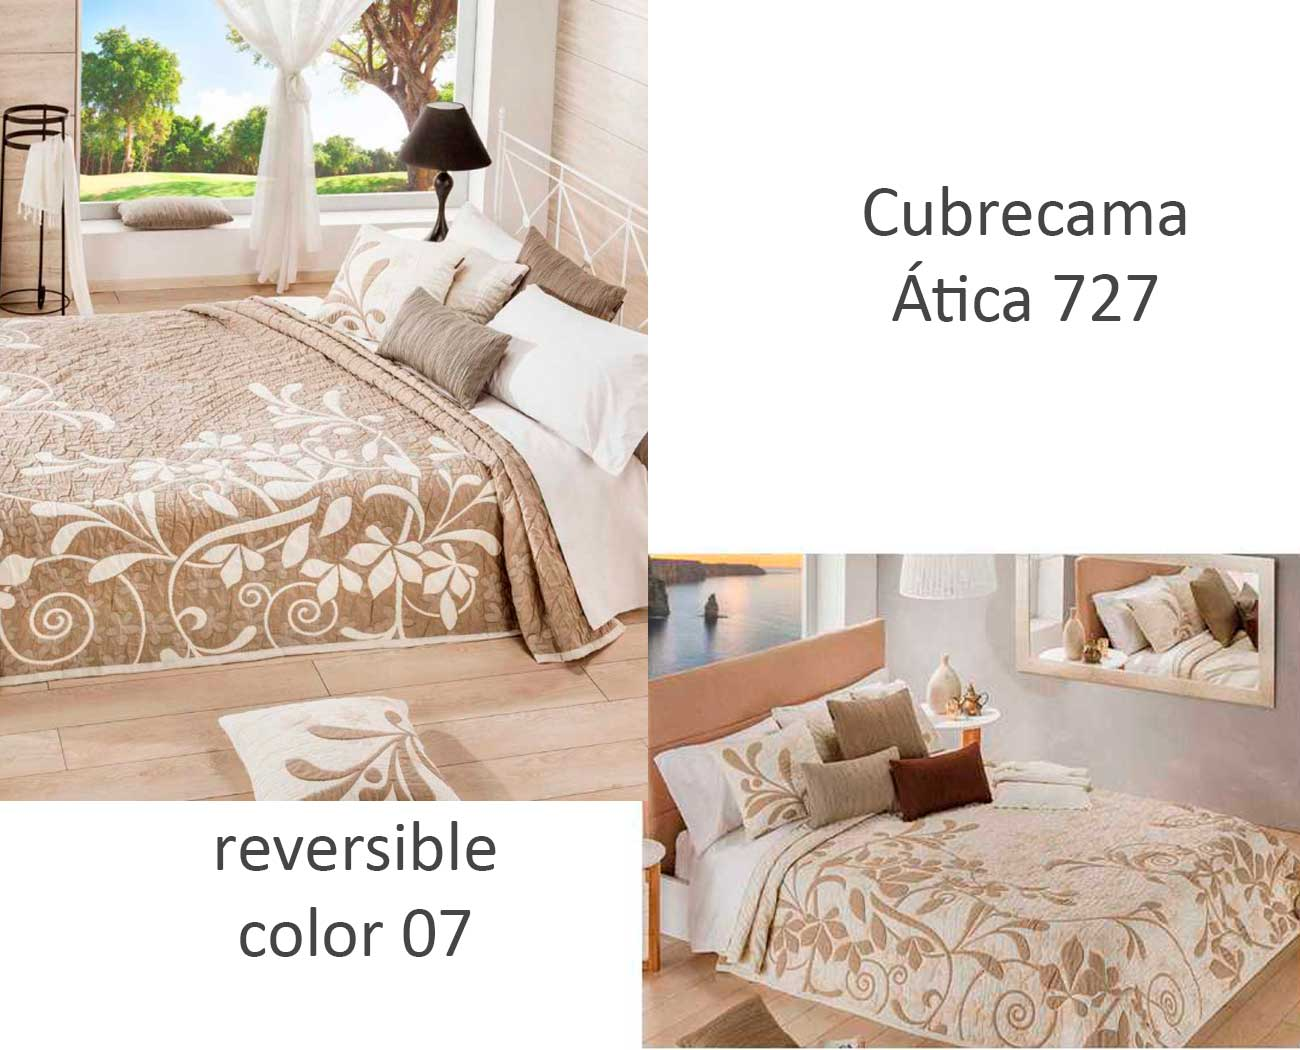 CUBRECAMA ATICA 727